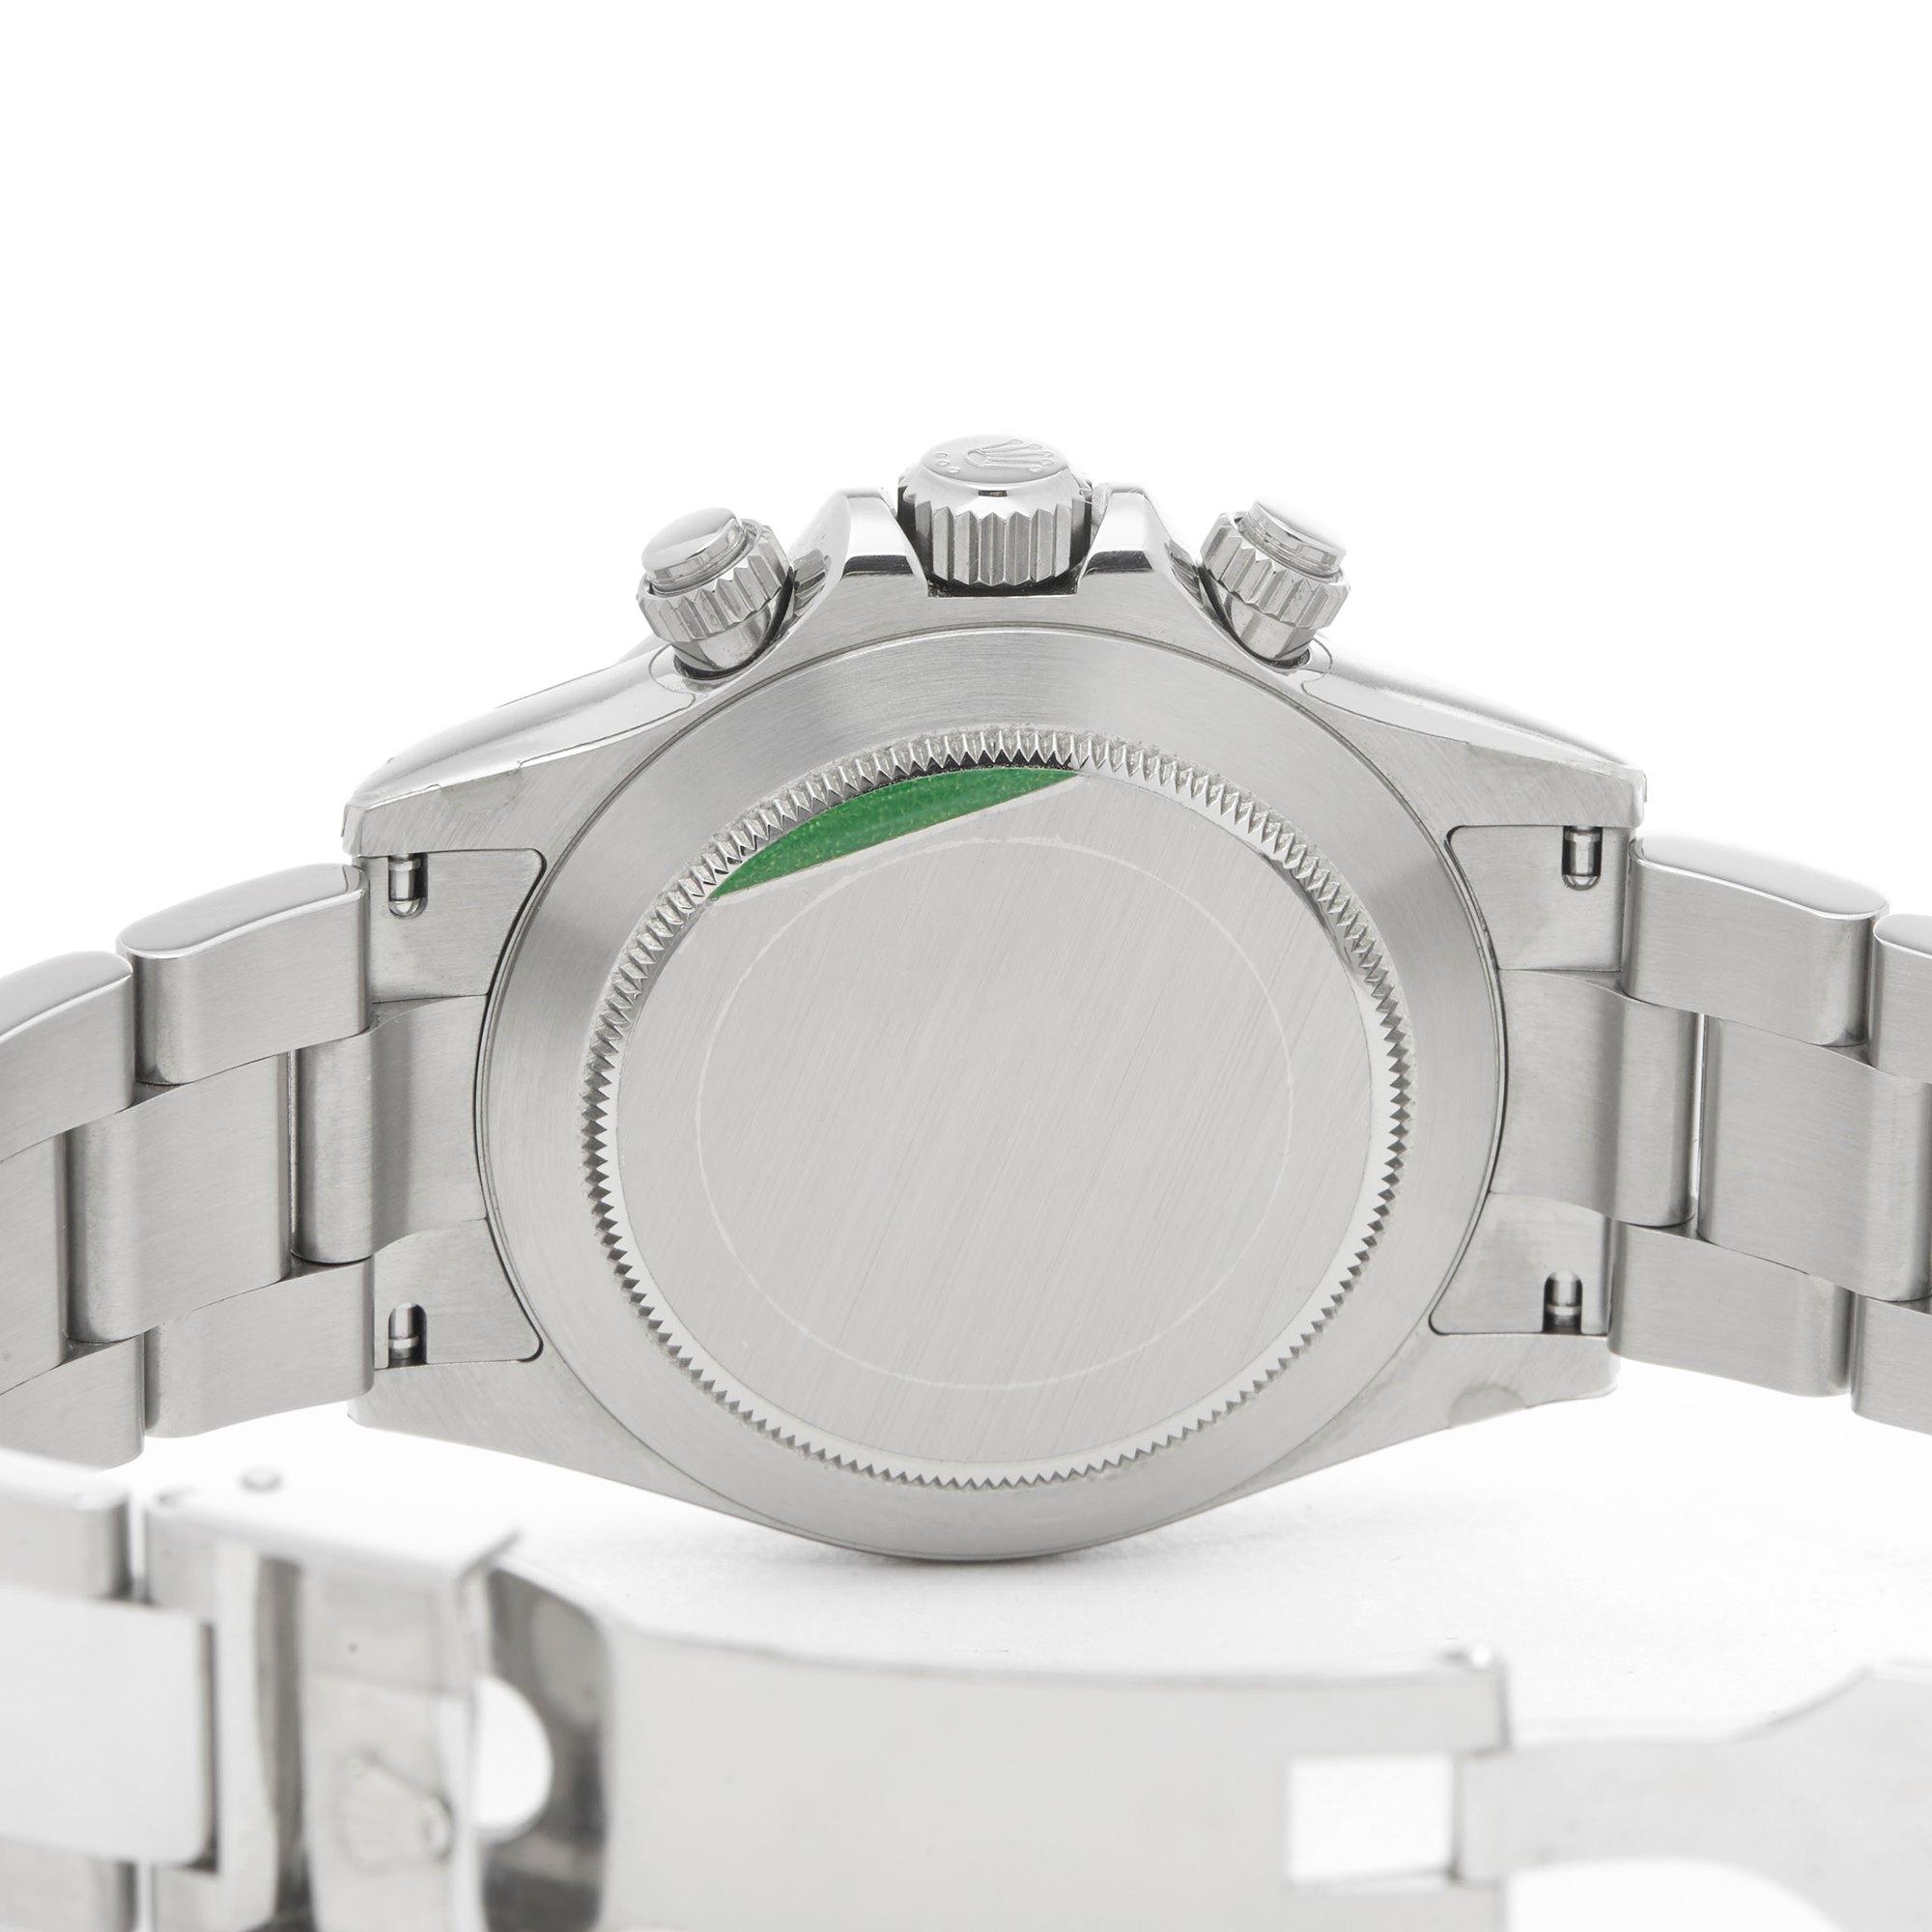 Rolex Daytona Chronograph NOS Stainless Steel 116520